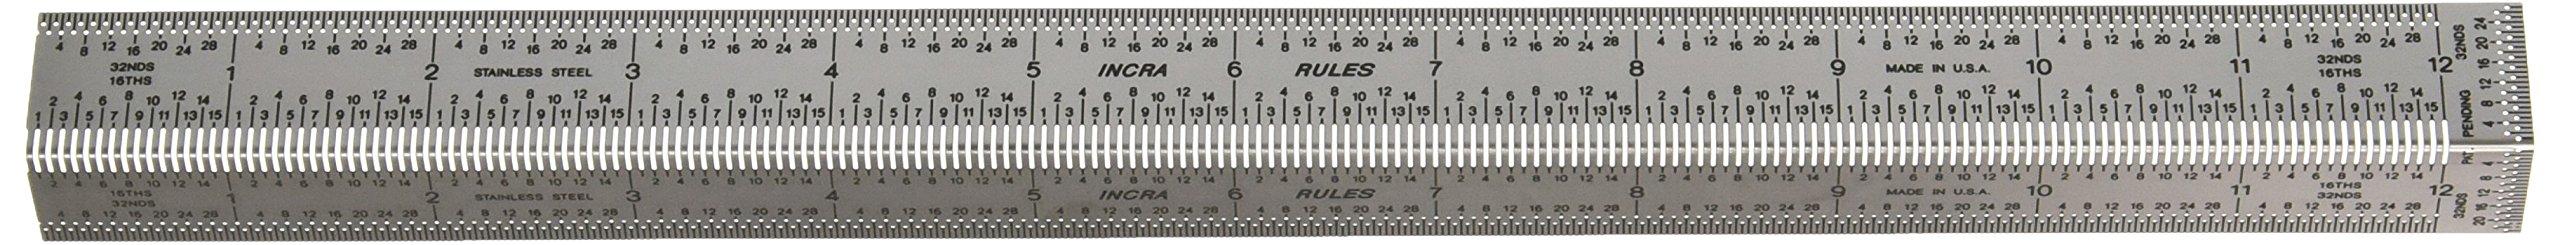 Incra BNDRUL12 12-Inch Incra Precision Bend Rule